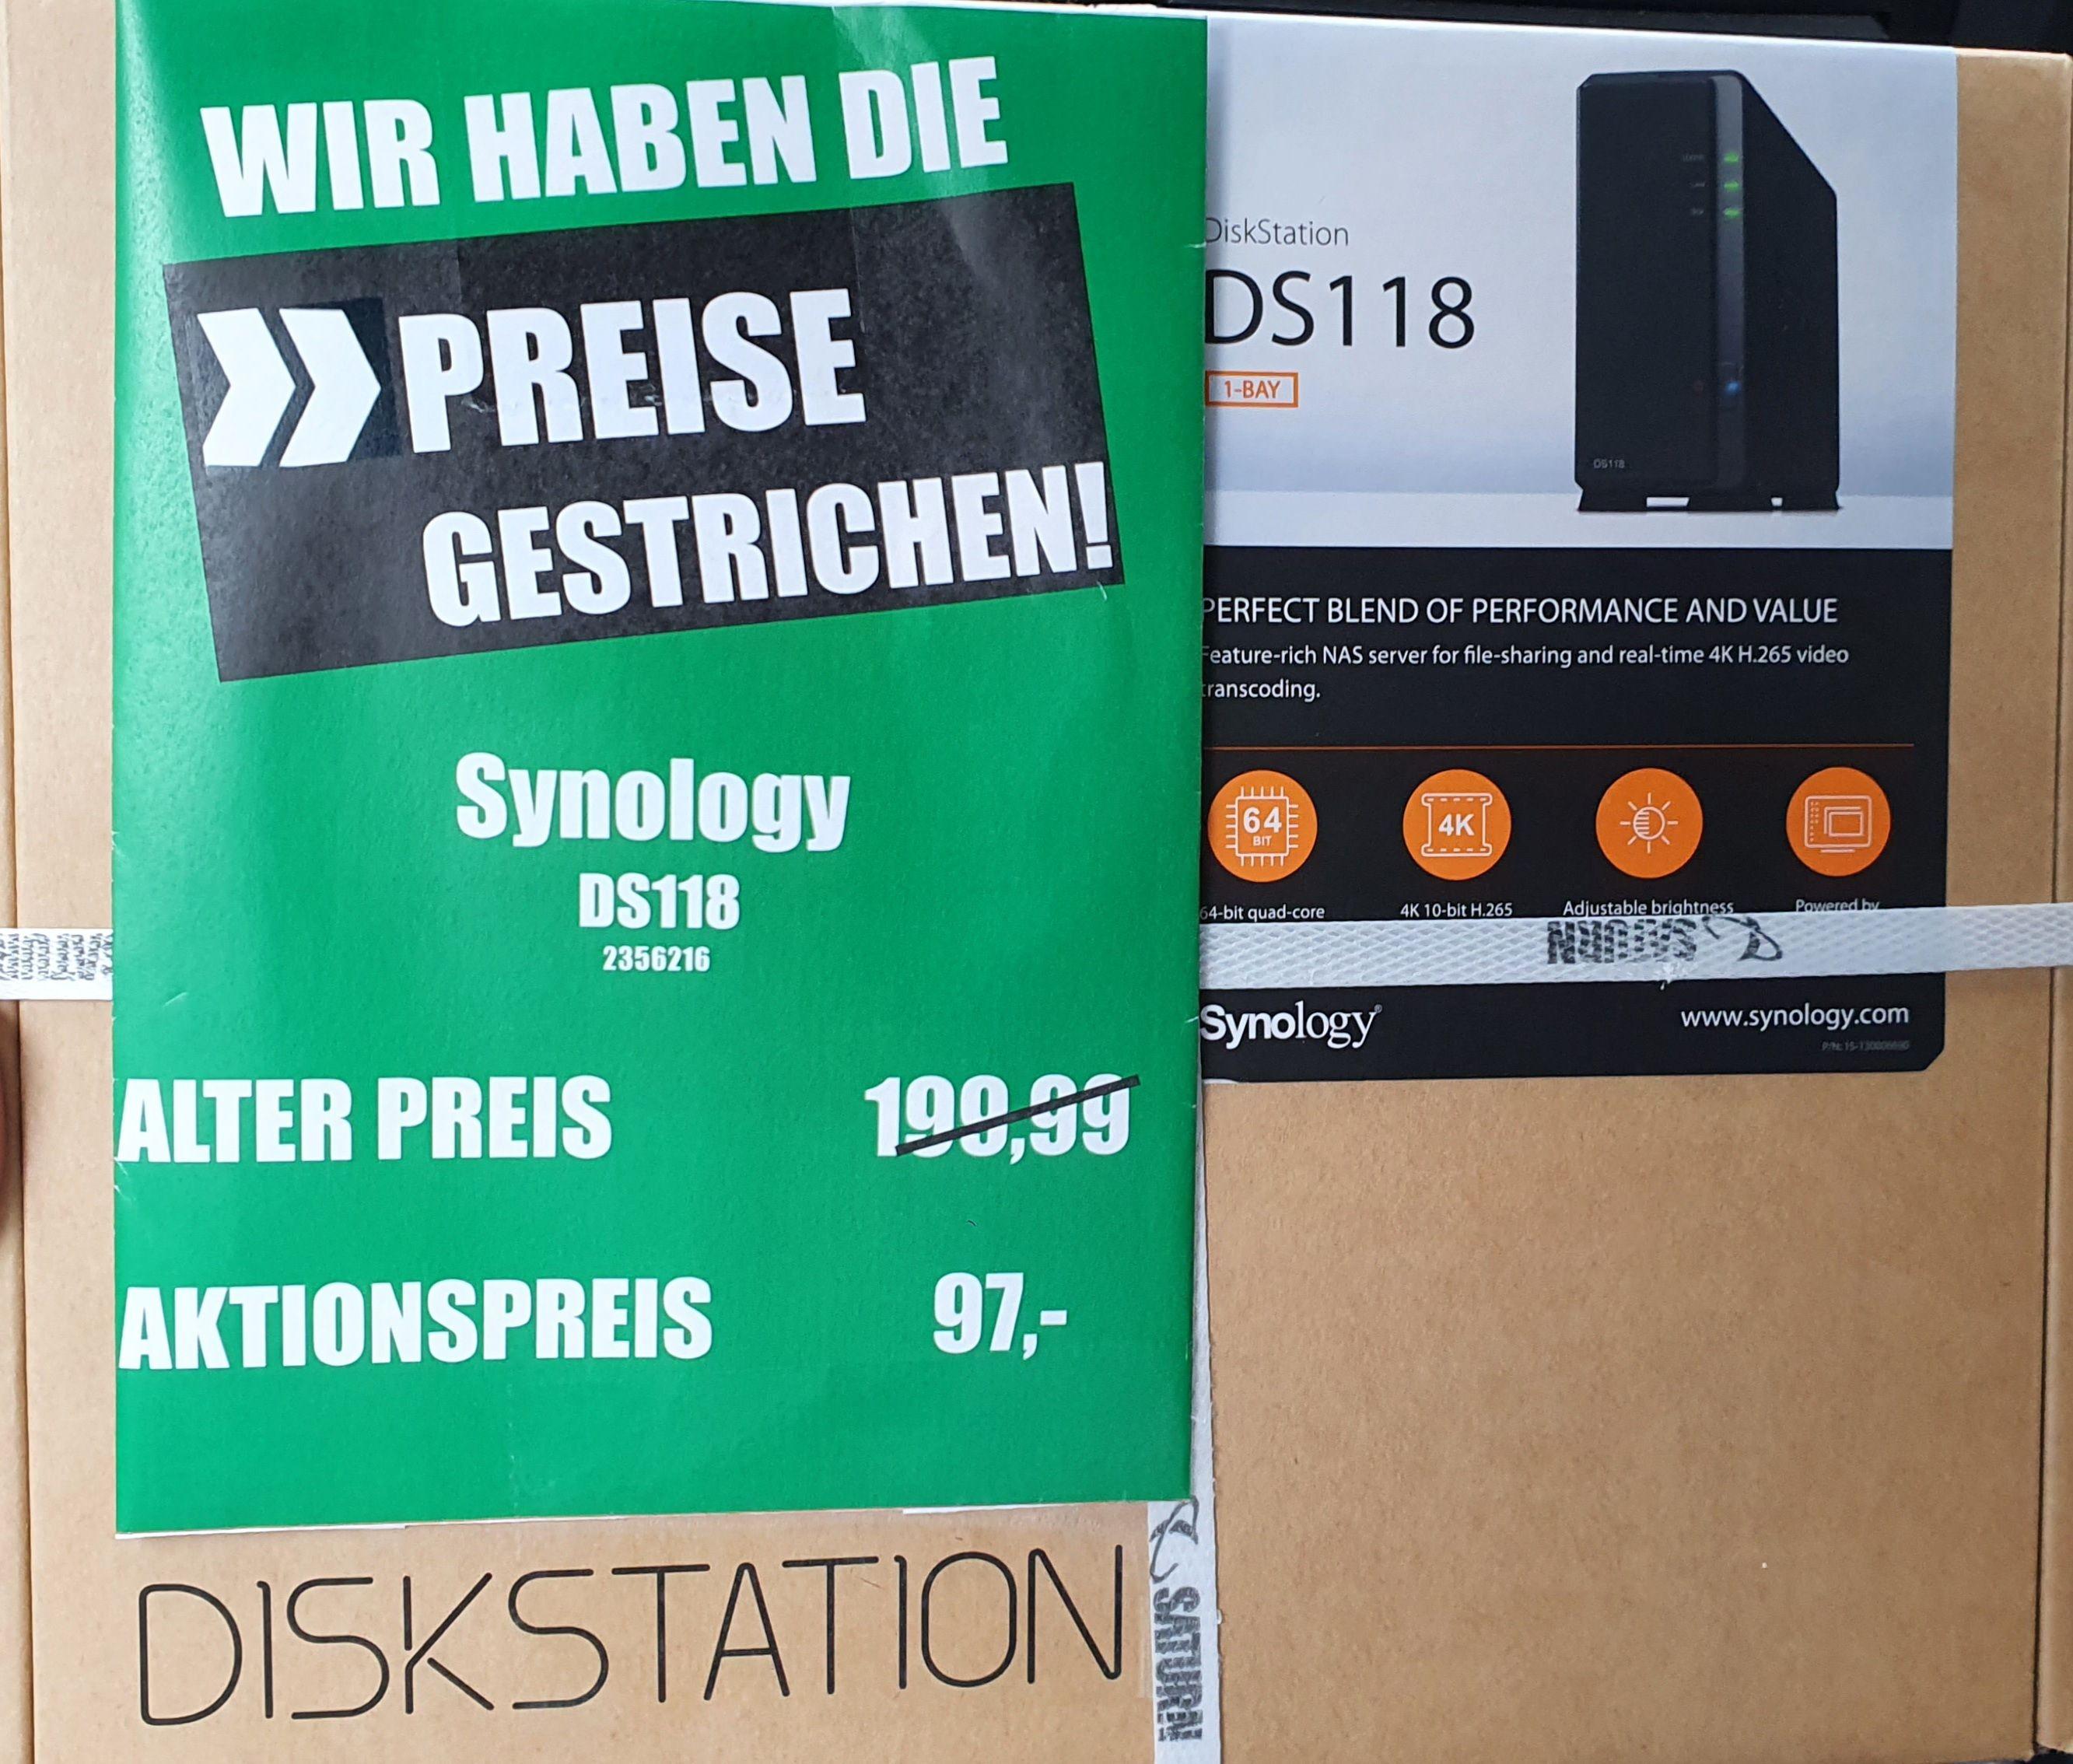 Mannheimer Saturn - Synology DS118 Diskstation